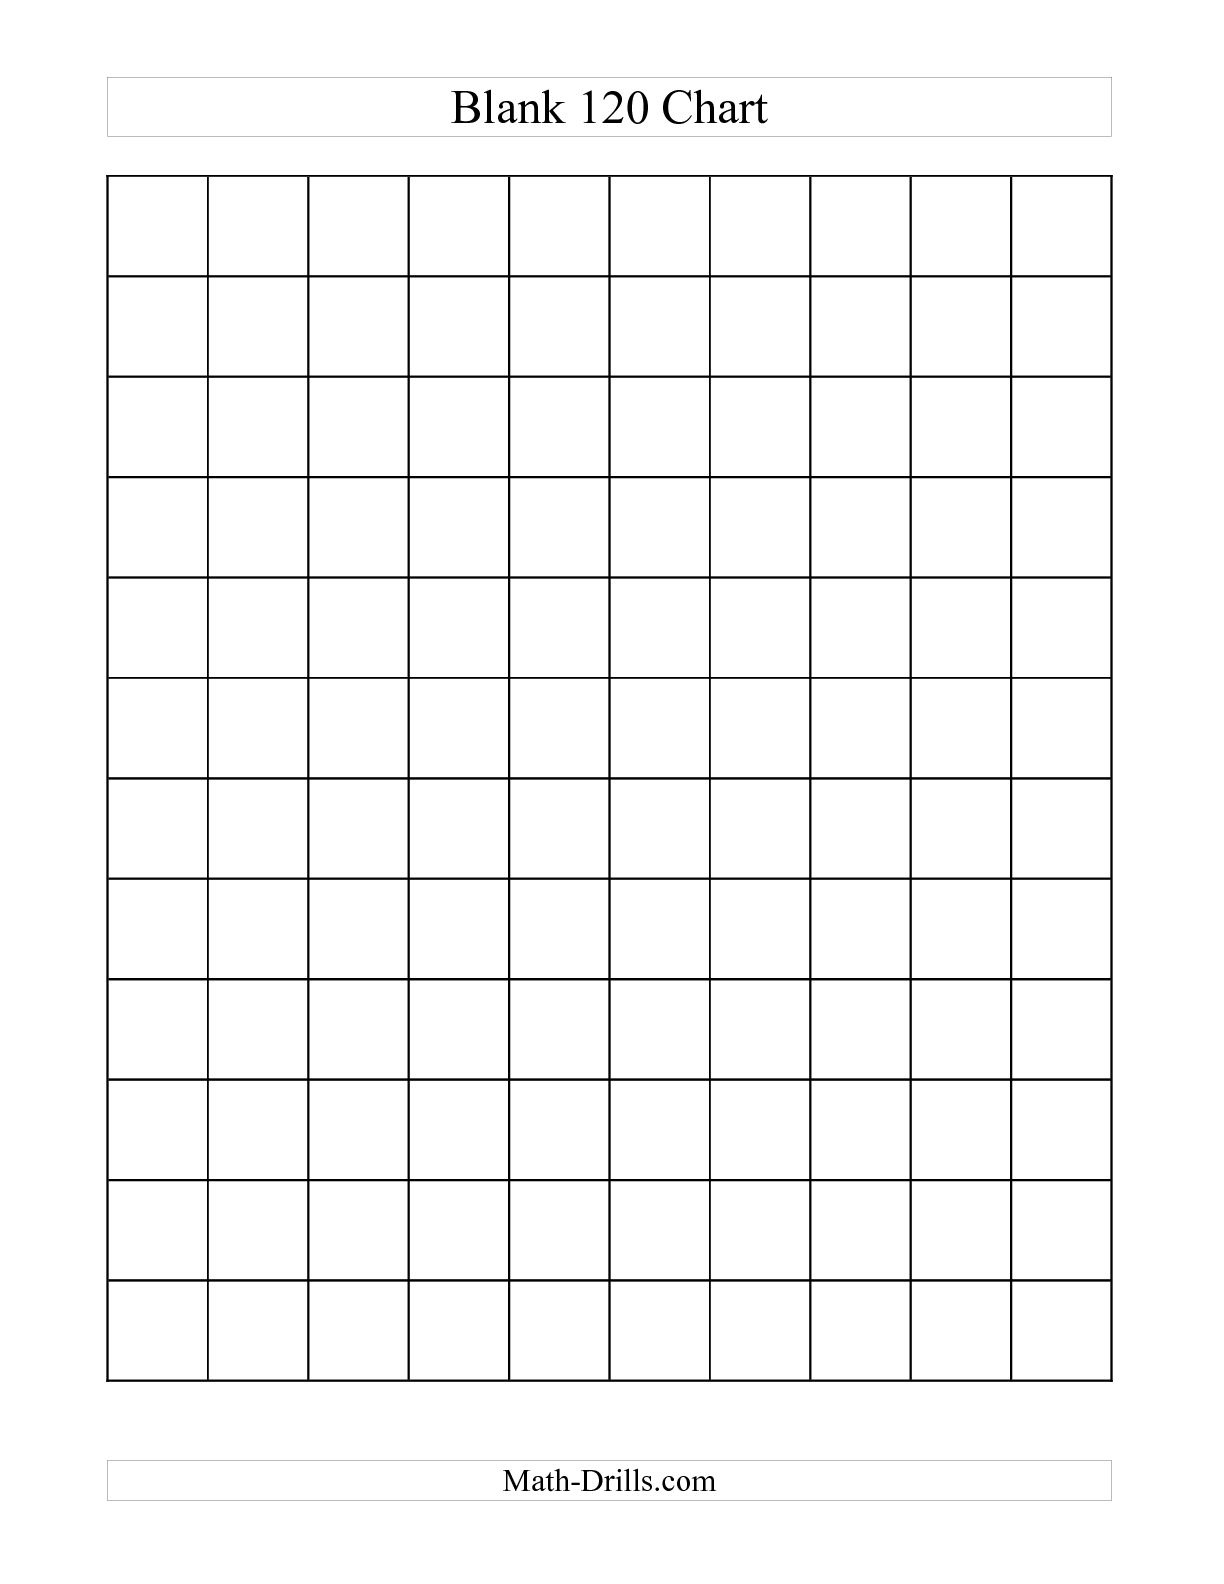 Math : Blank Hundreds Chart Blank Hundreds Chart 1-120. Free Blank - Free Printable Hundreds Chart